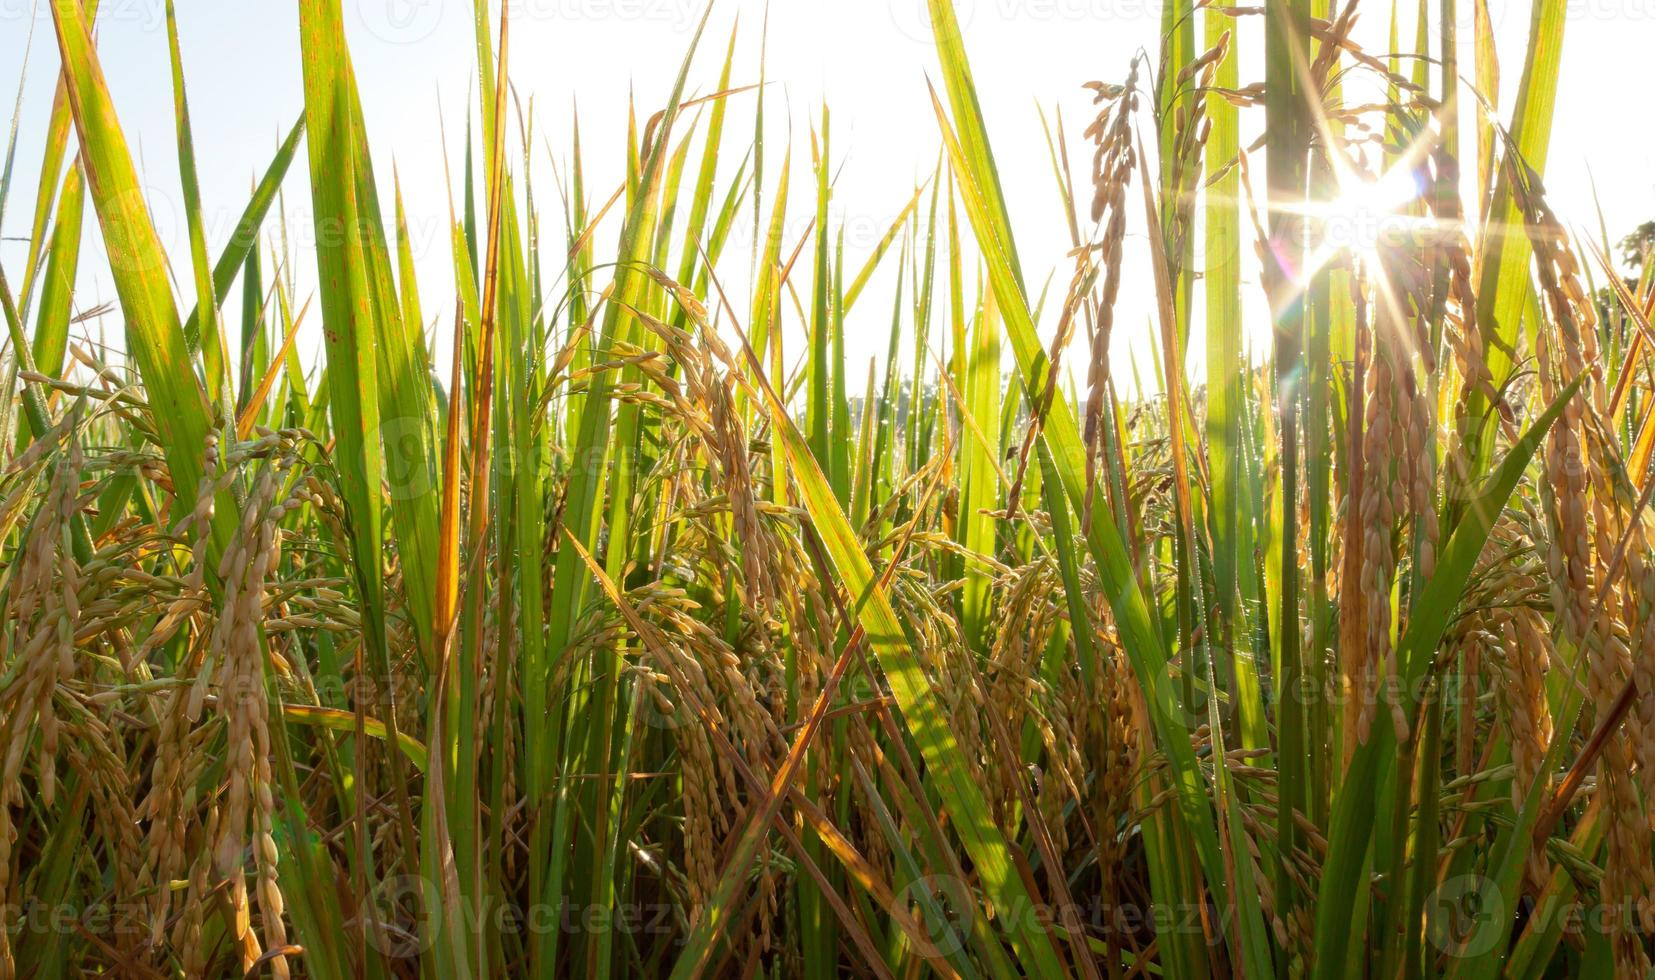 zonnige dag op rijstveld foto